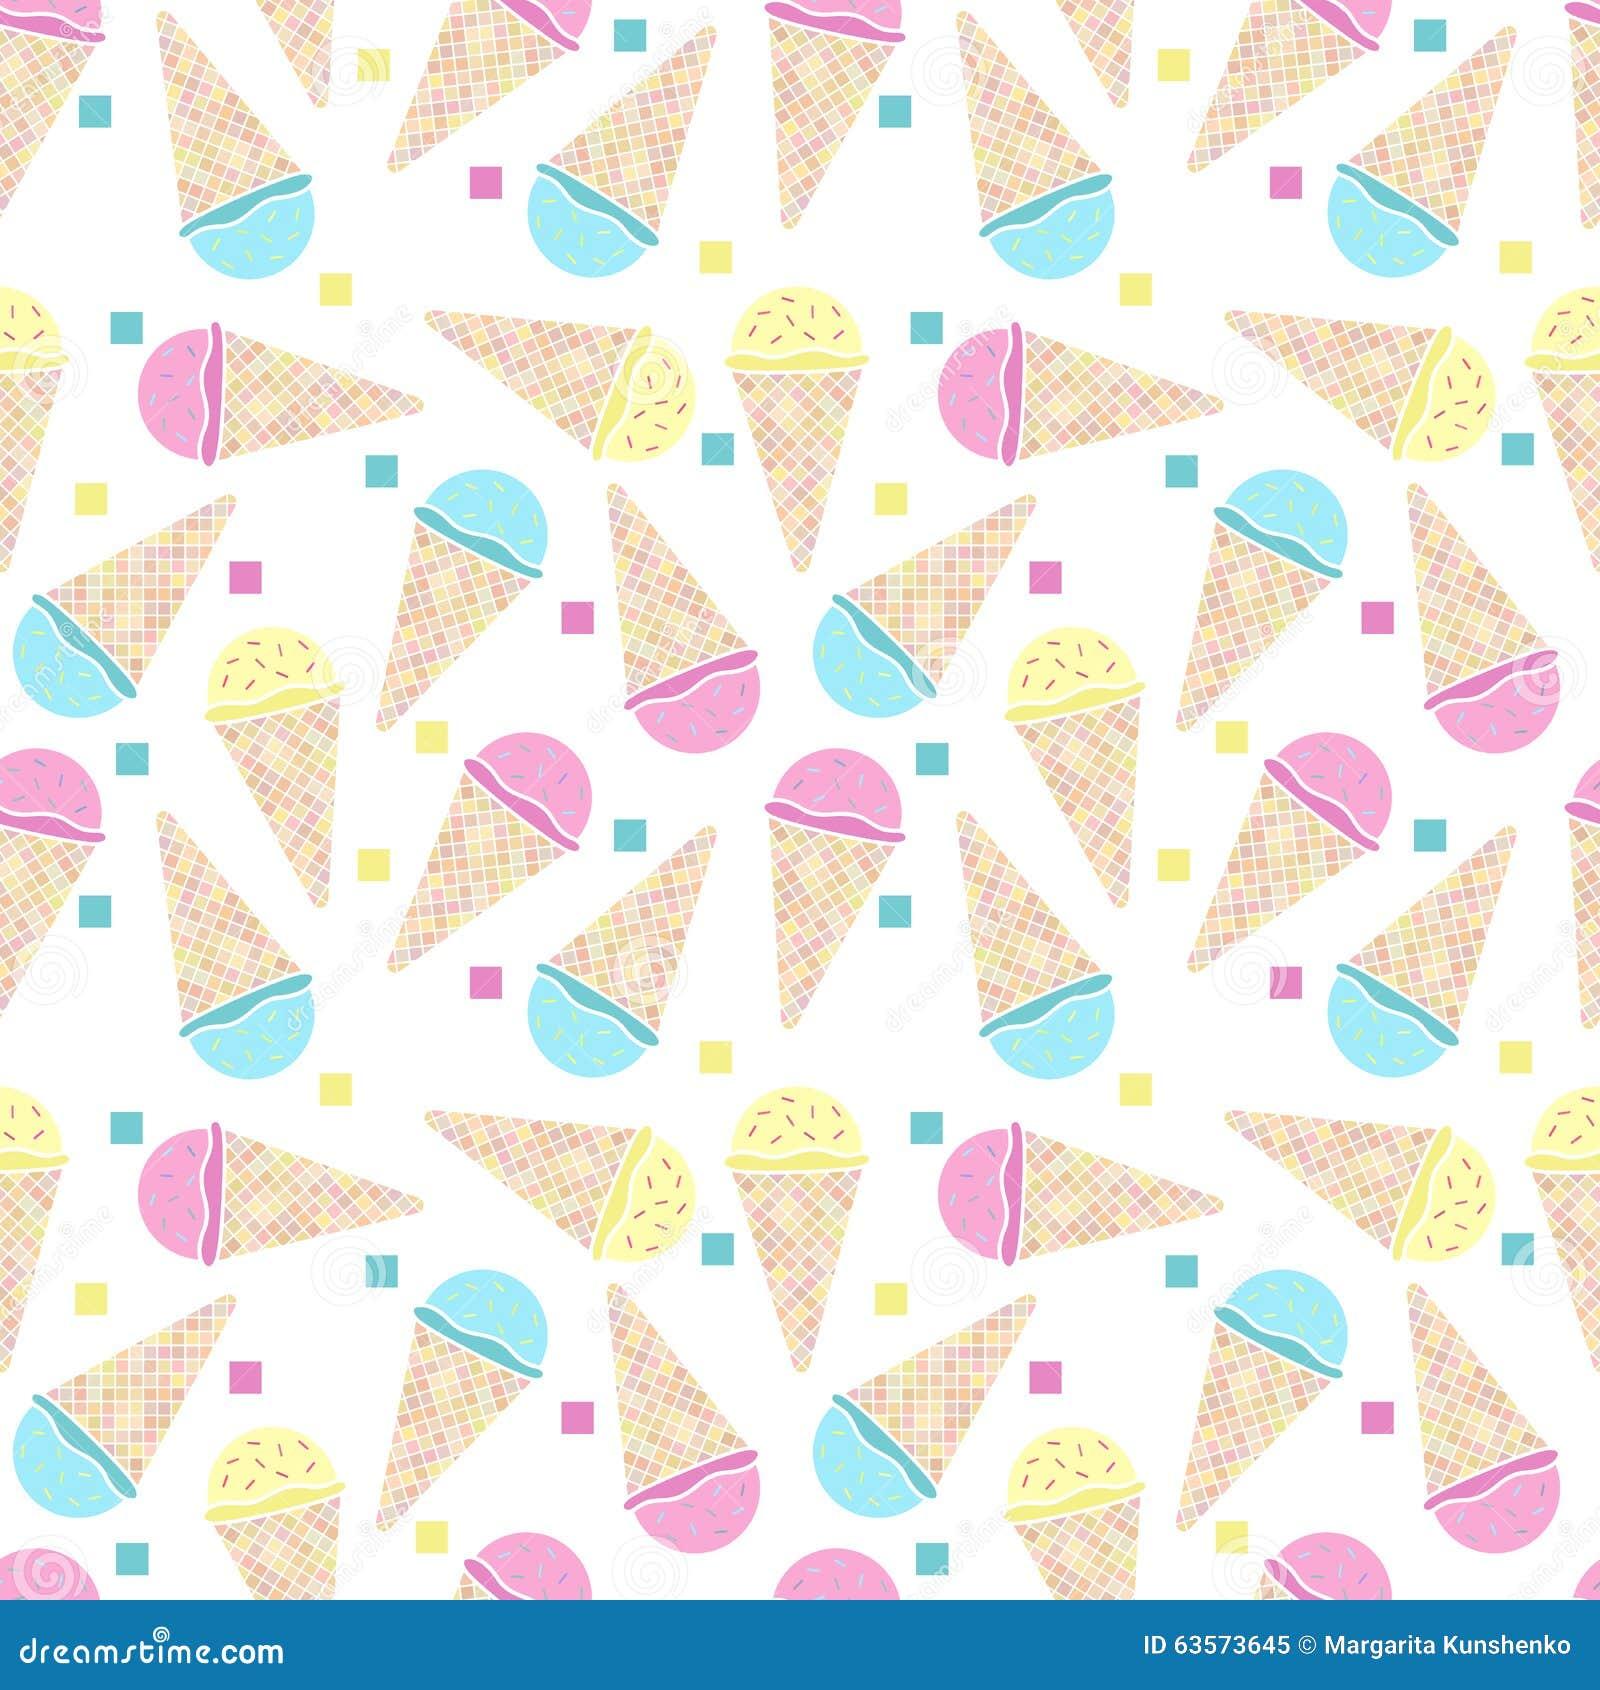 Ice Cream Cones Seamless Pattern Background Stock Vector: Seamless Ice Cream Pattern Stock Vector